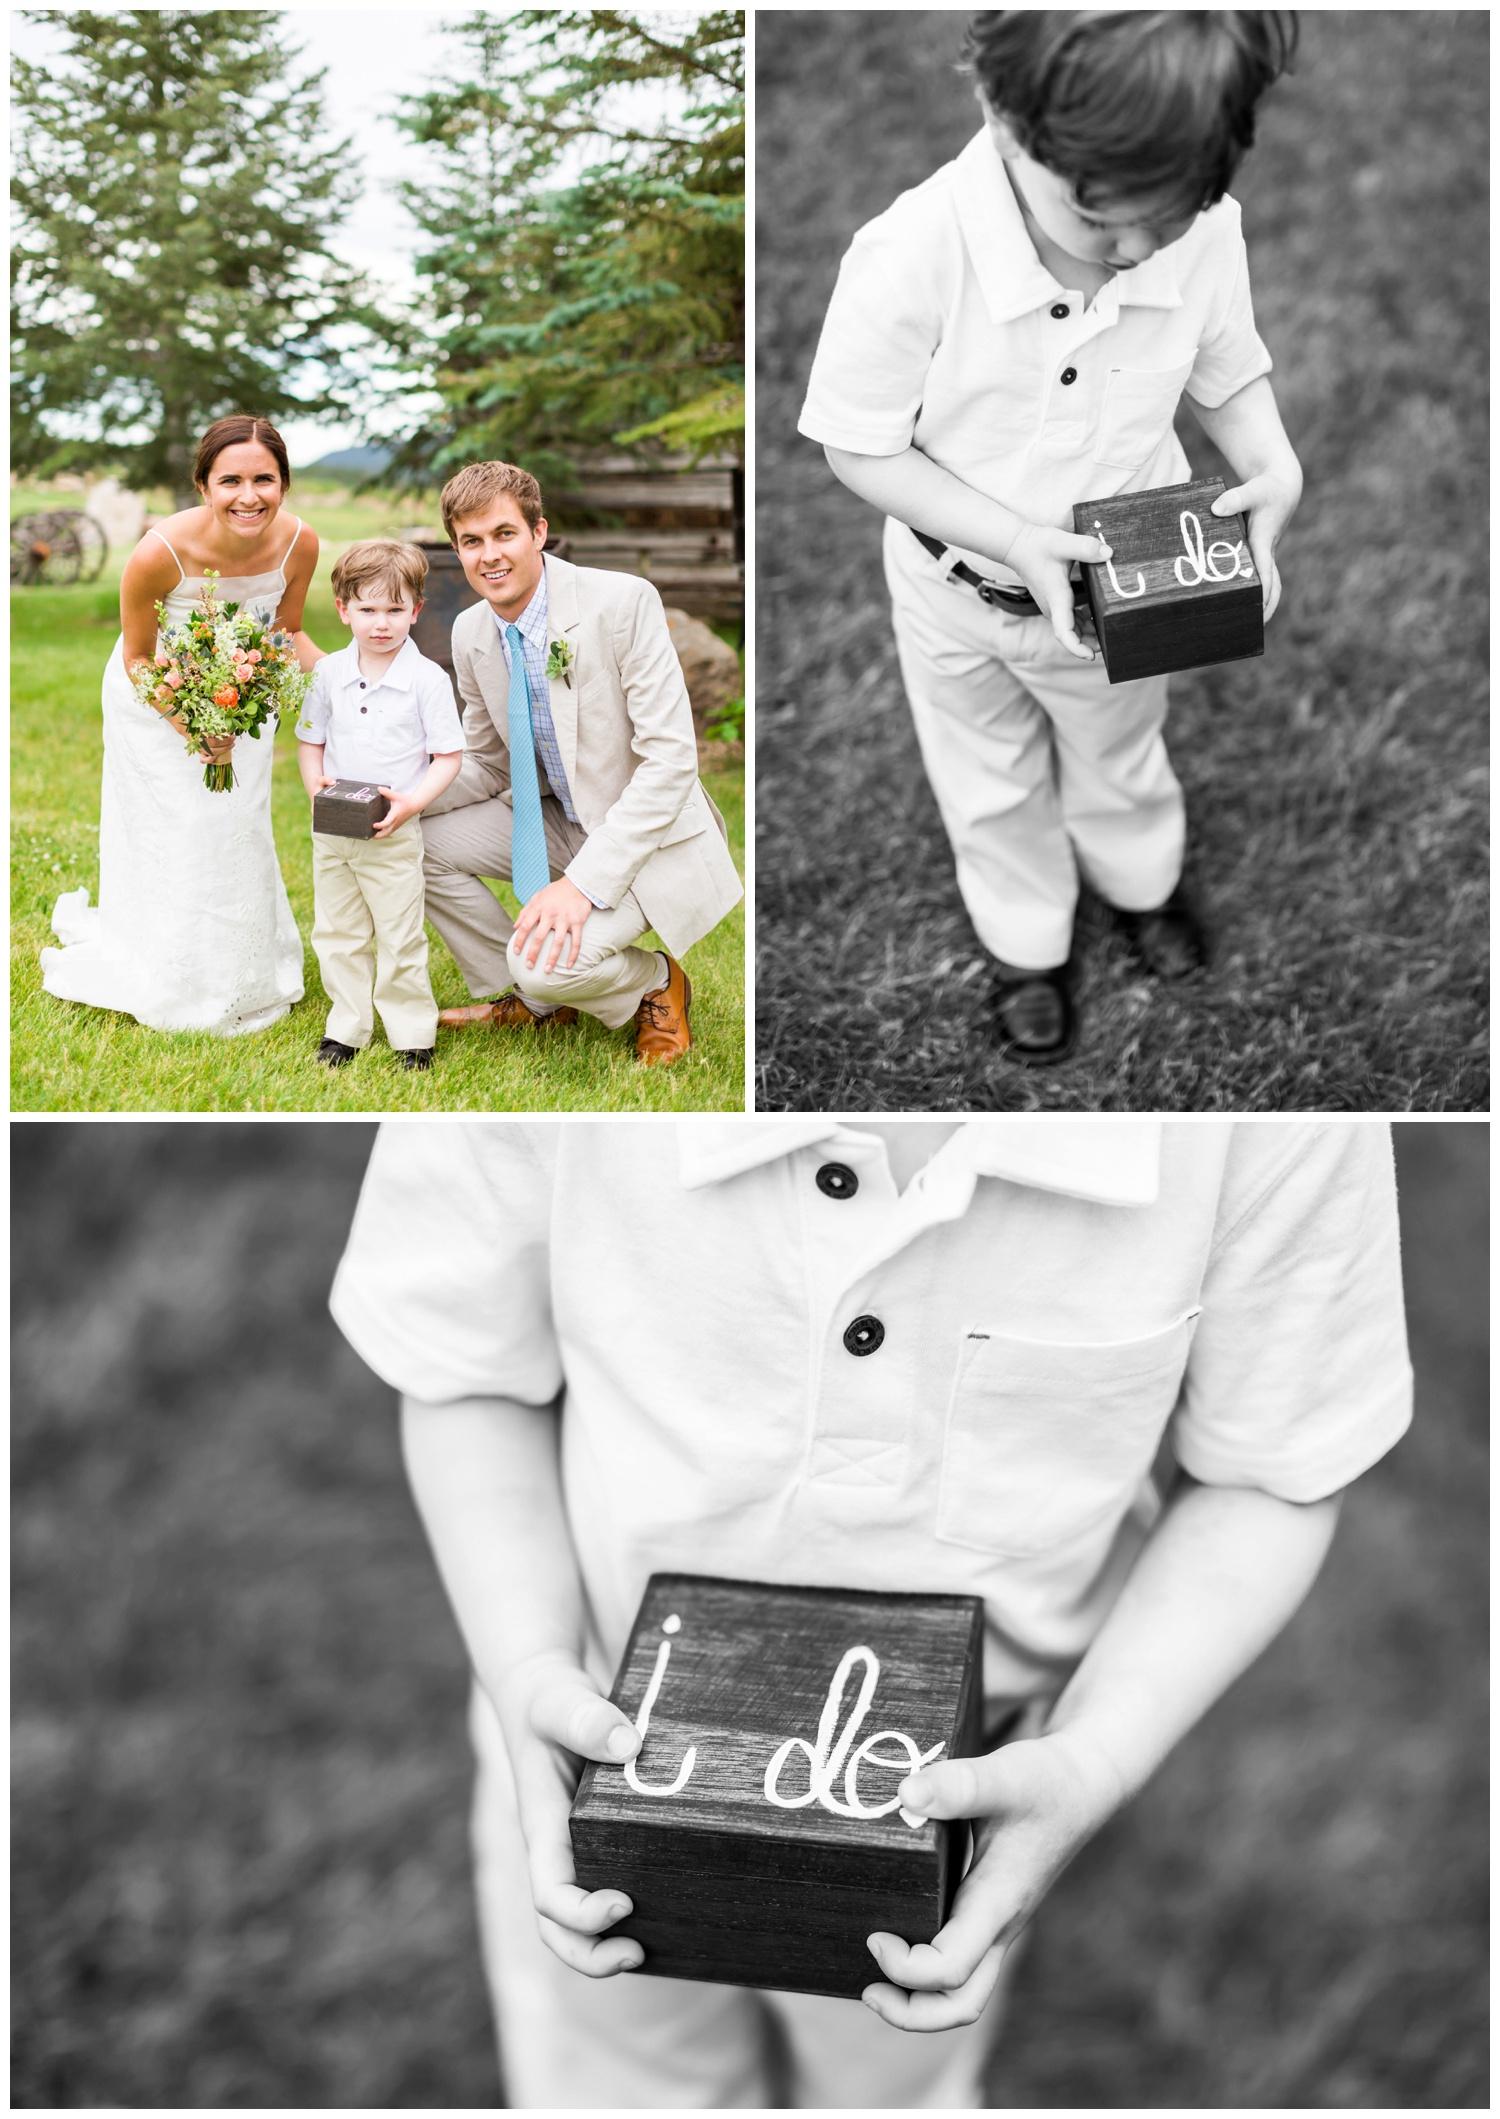 evergreen wedding photography007.jpg